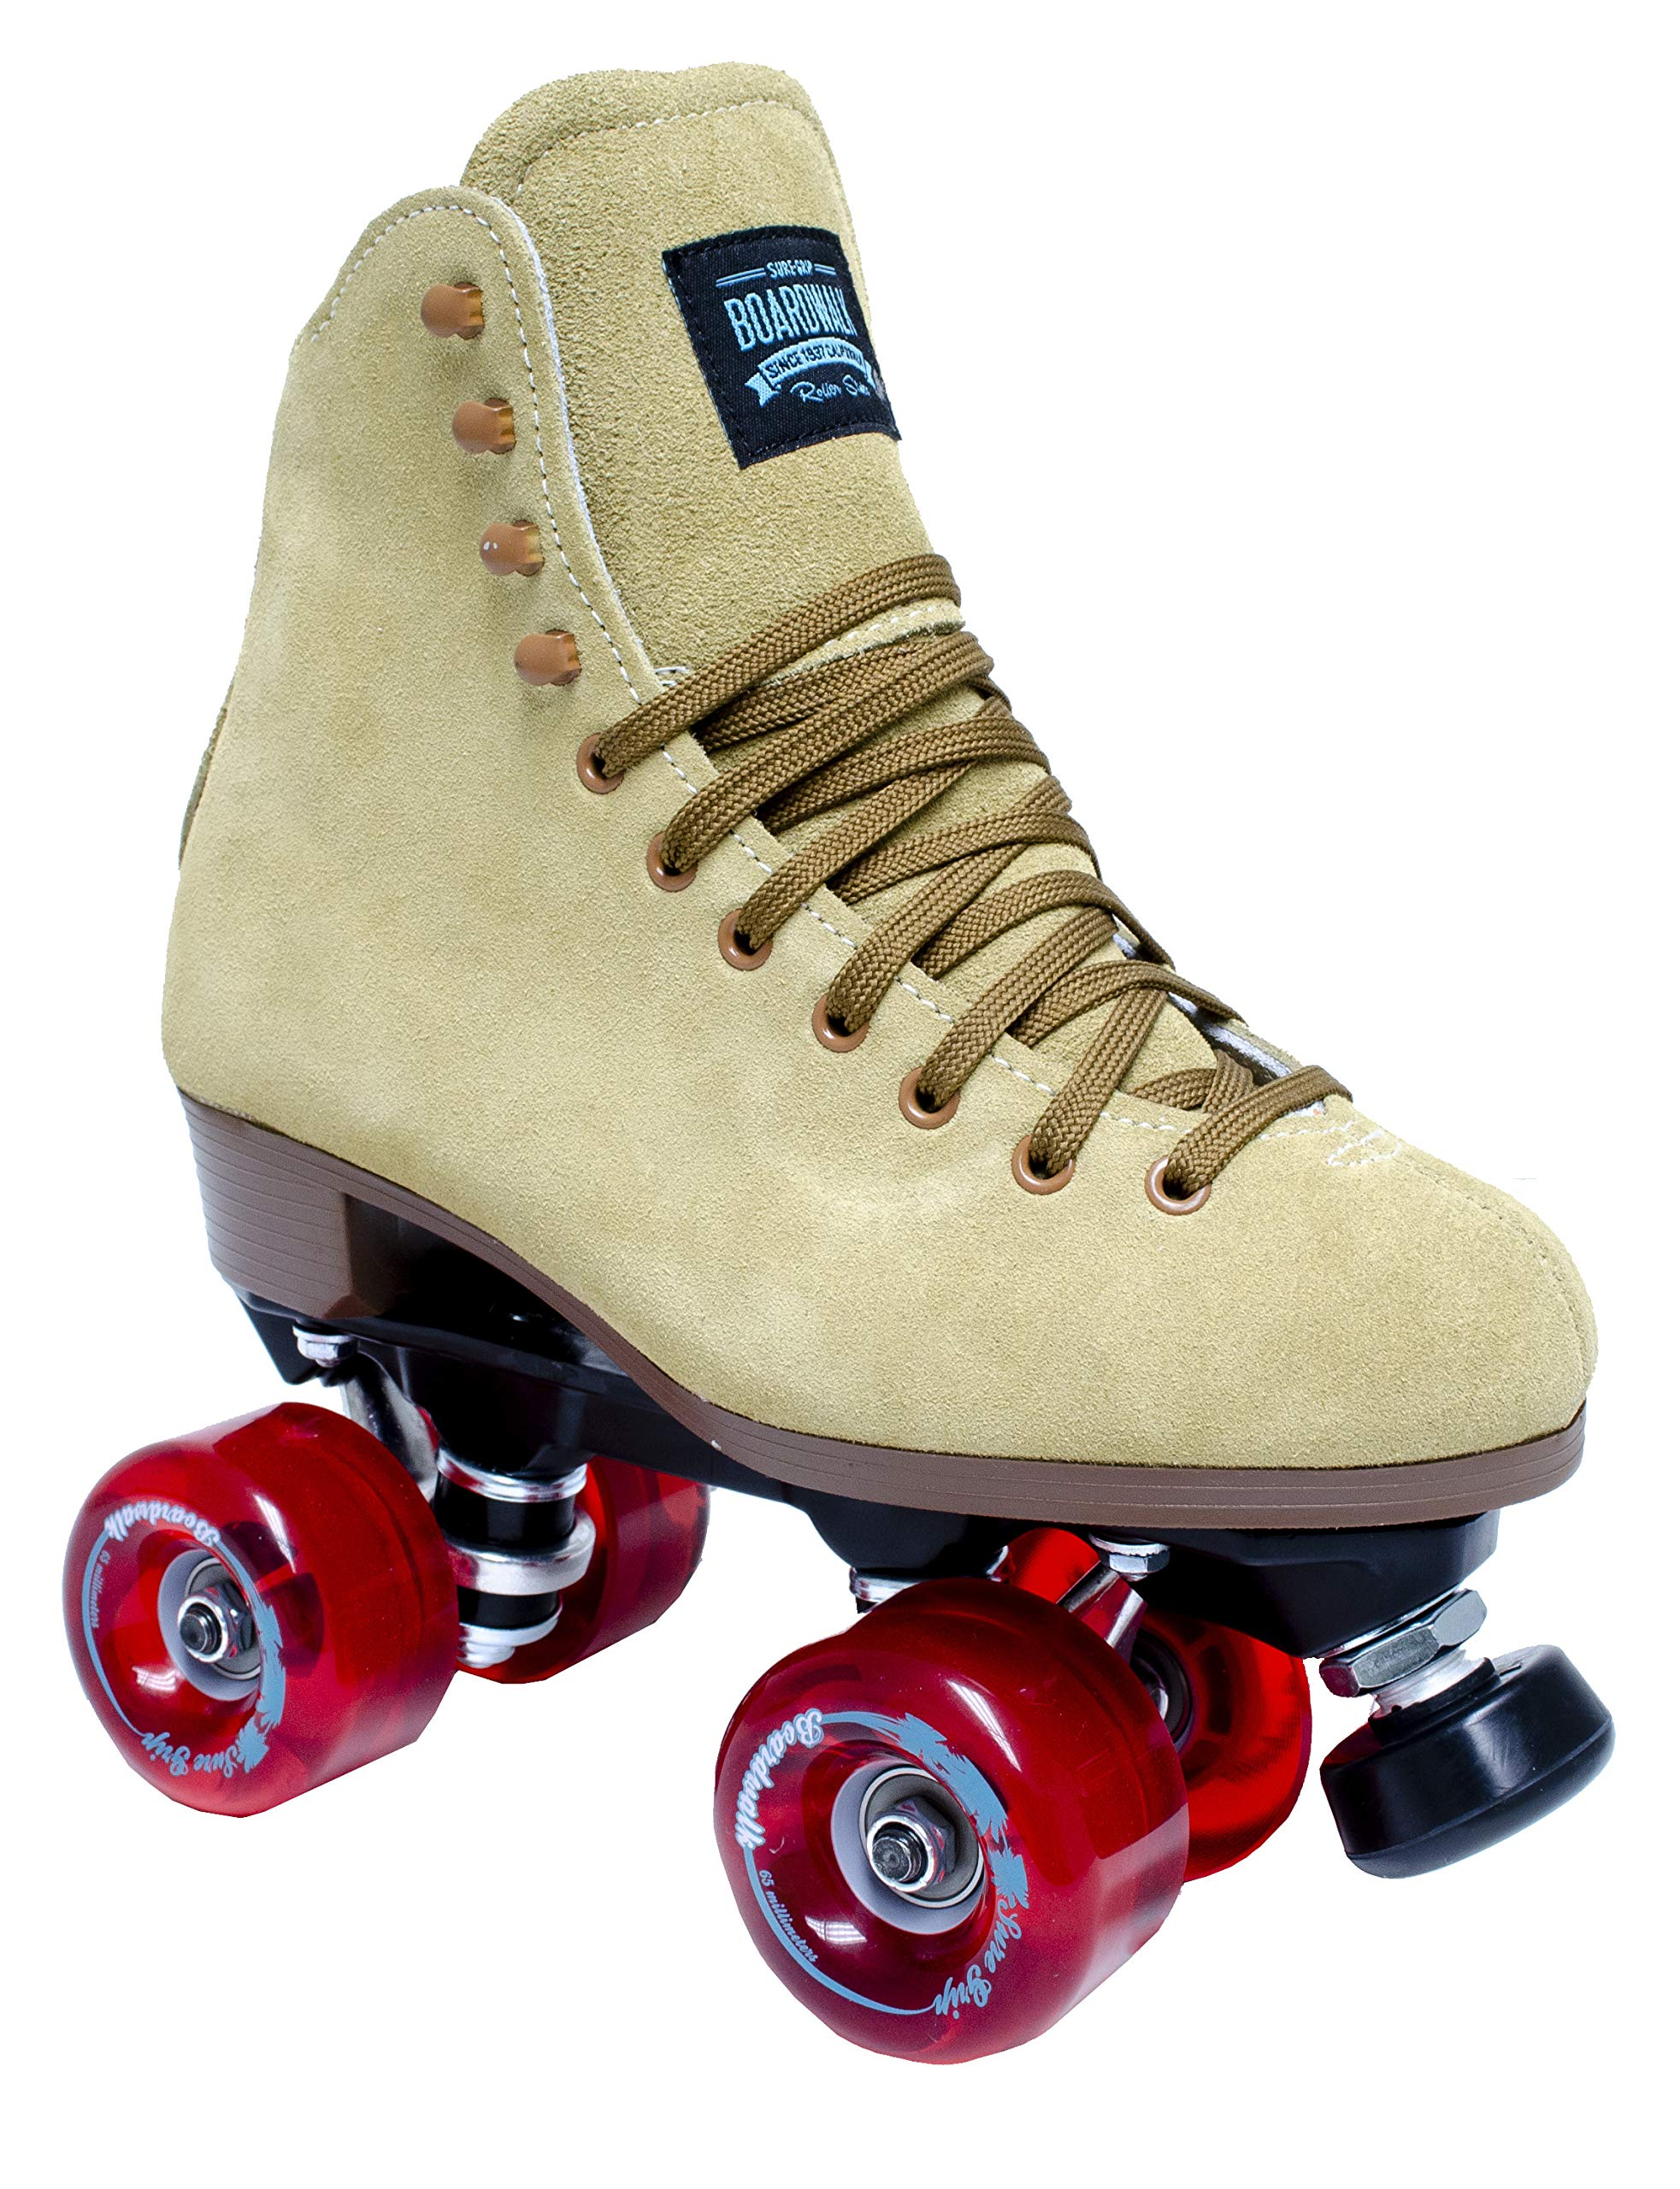 Sure-Grip Tan Boardwalk Skates (4)